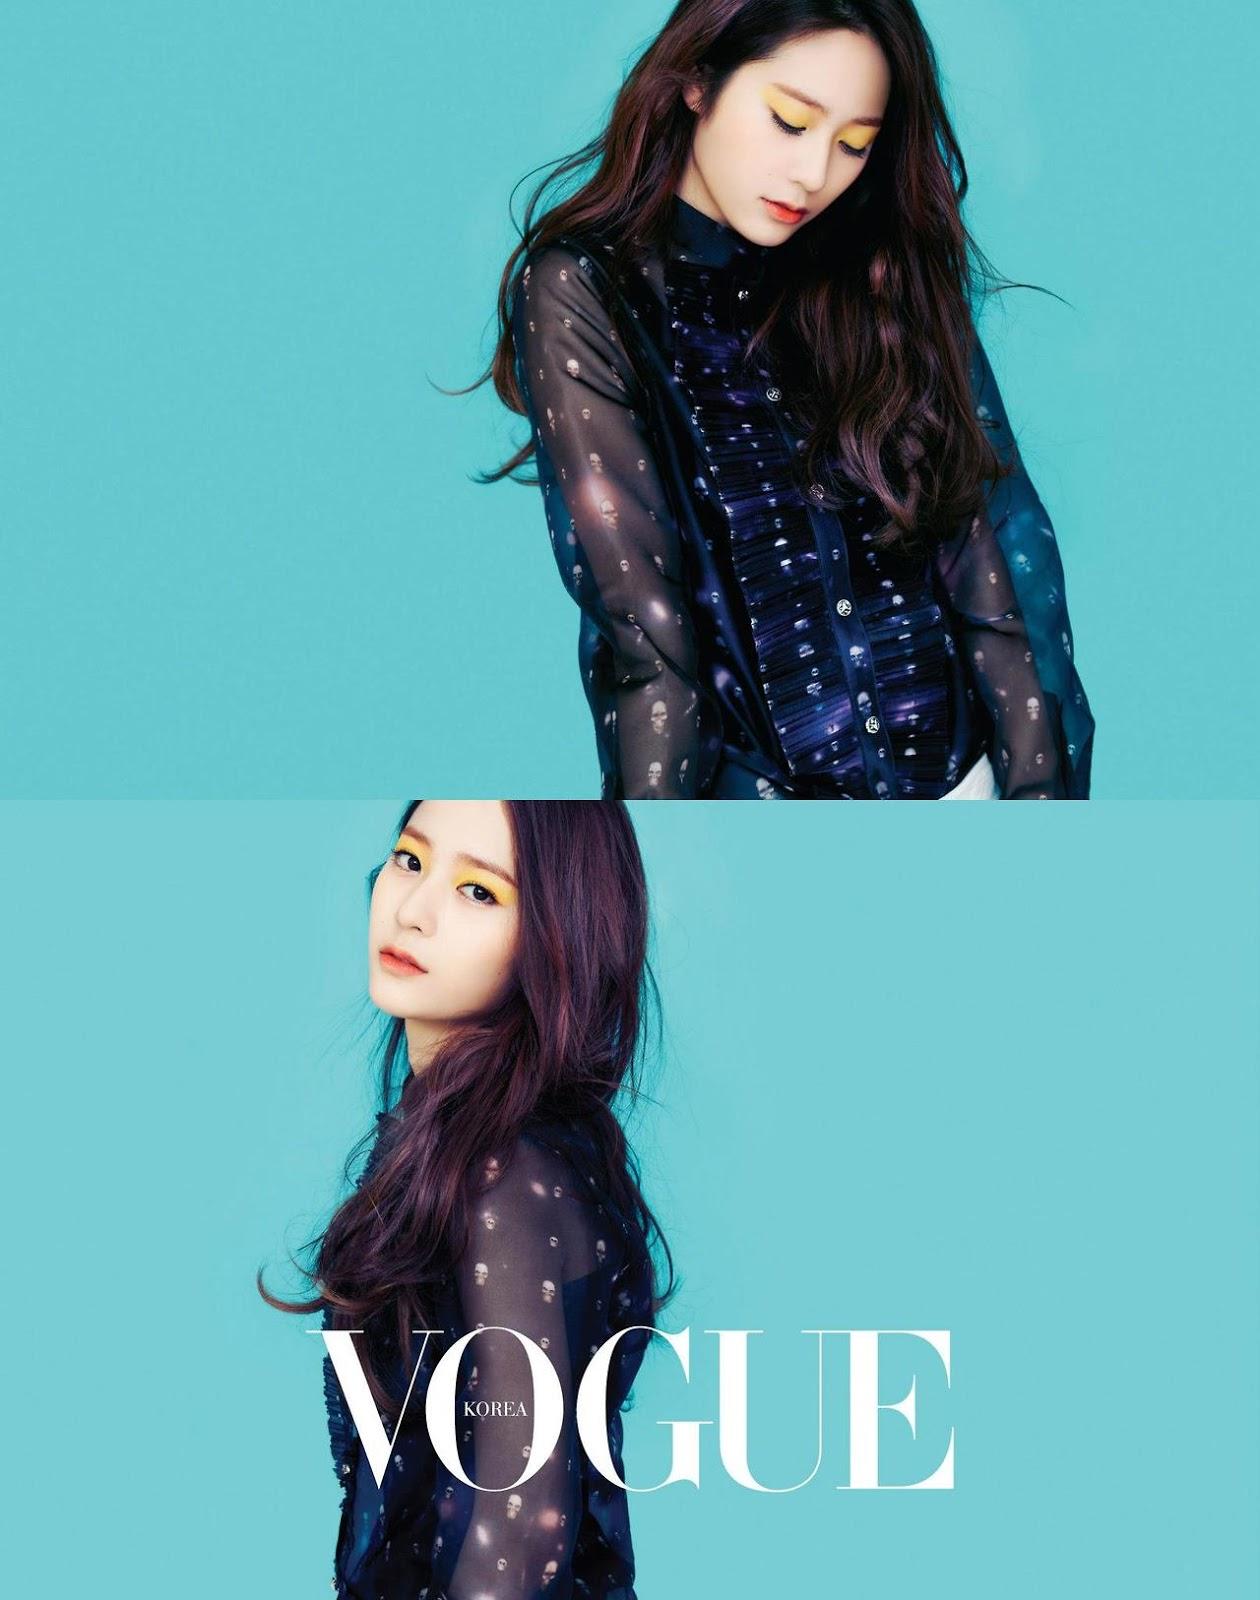 f(x) Krystal Vogue March 2013 Pictures | Hot Sexy Beauty.Club F(x) Krystal 2013